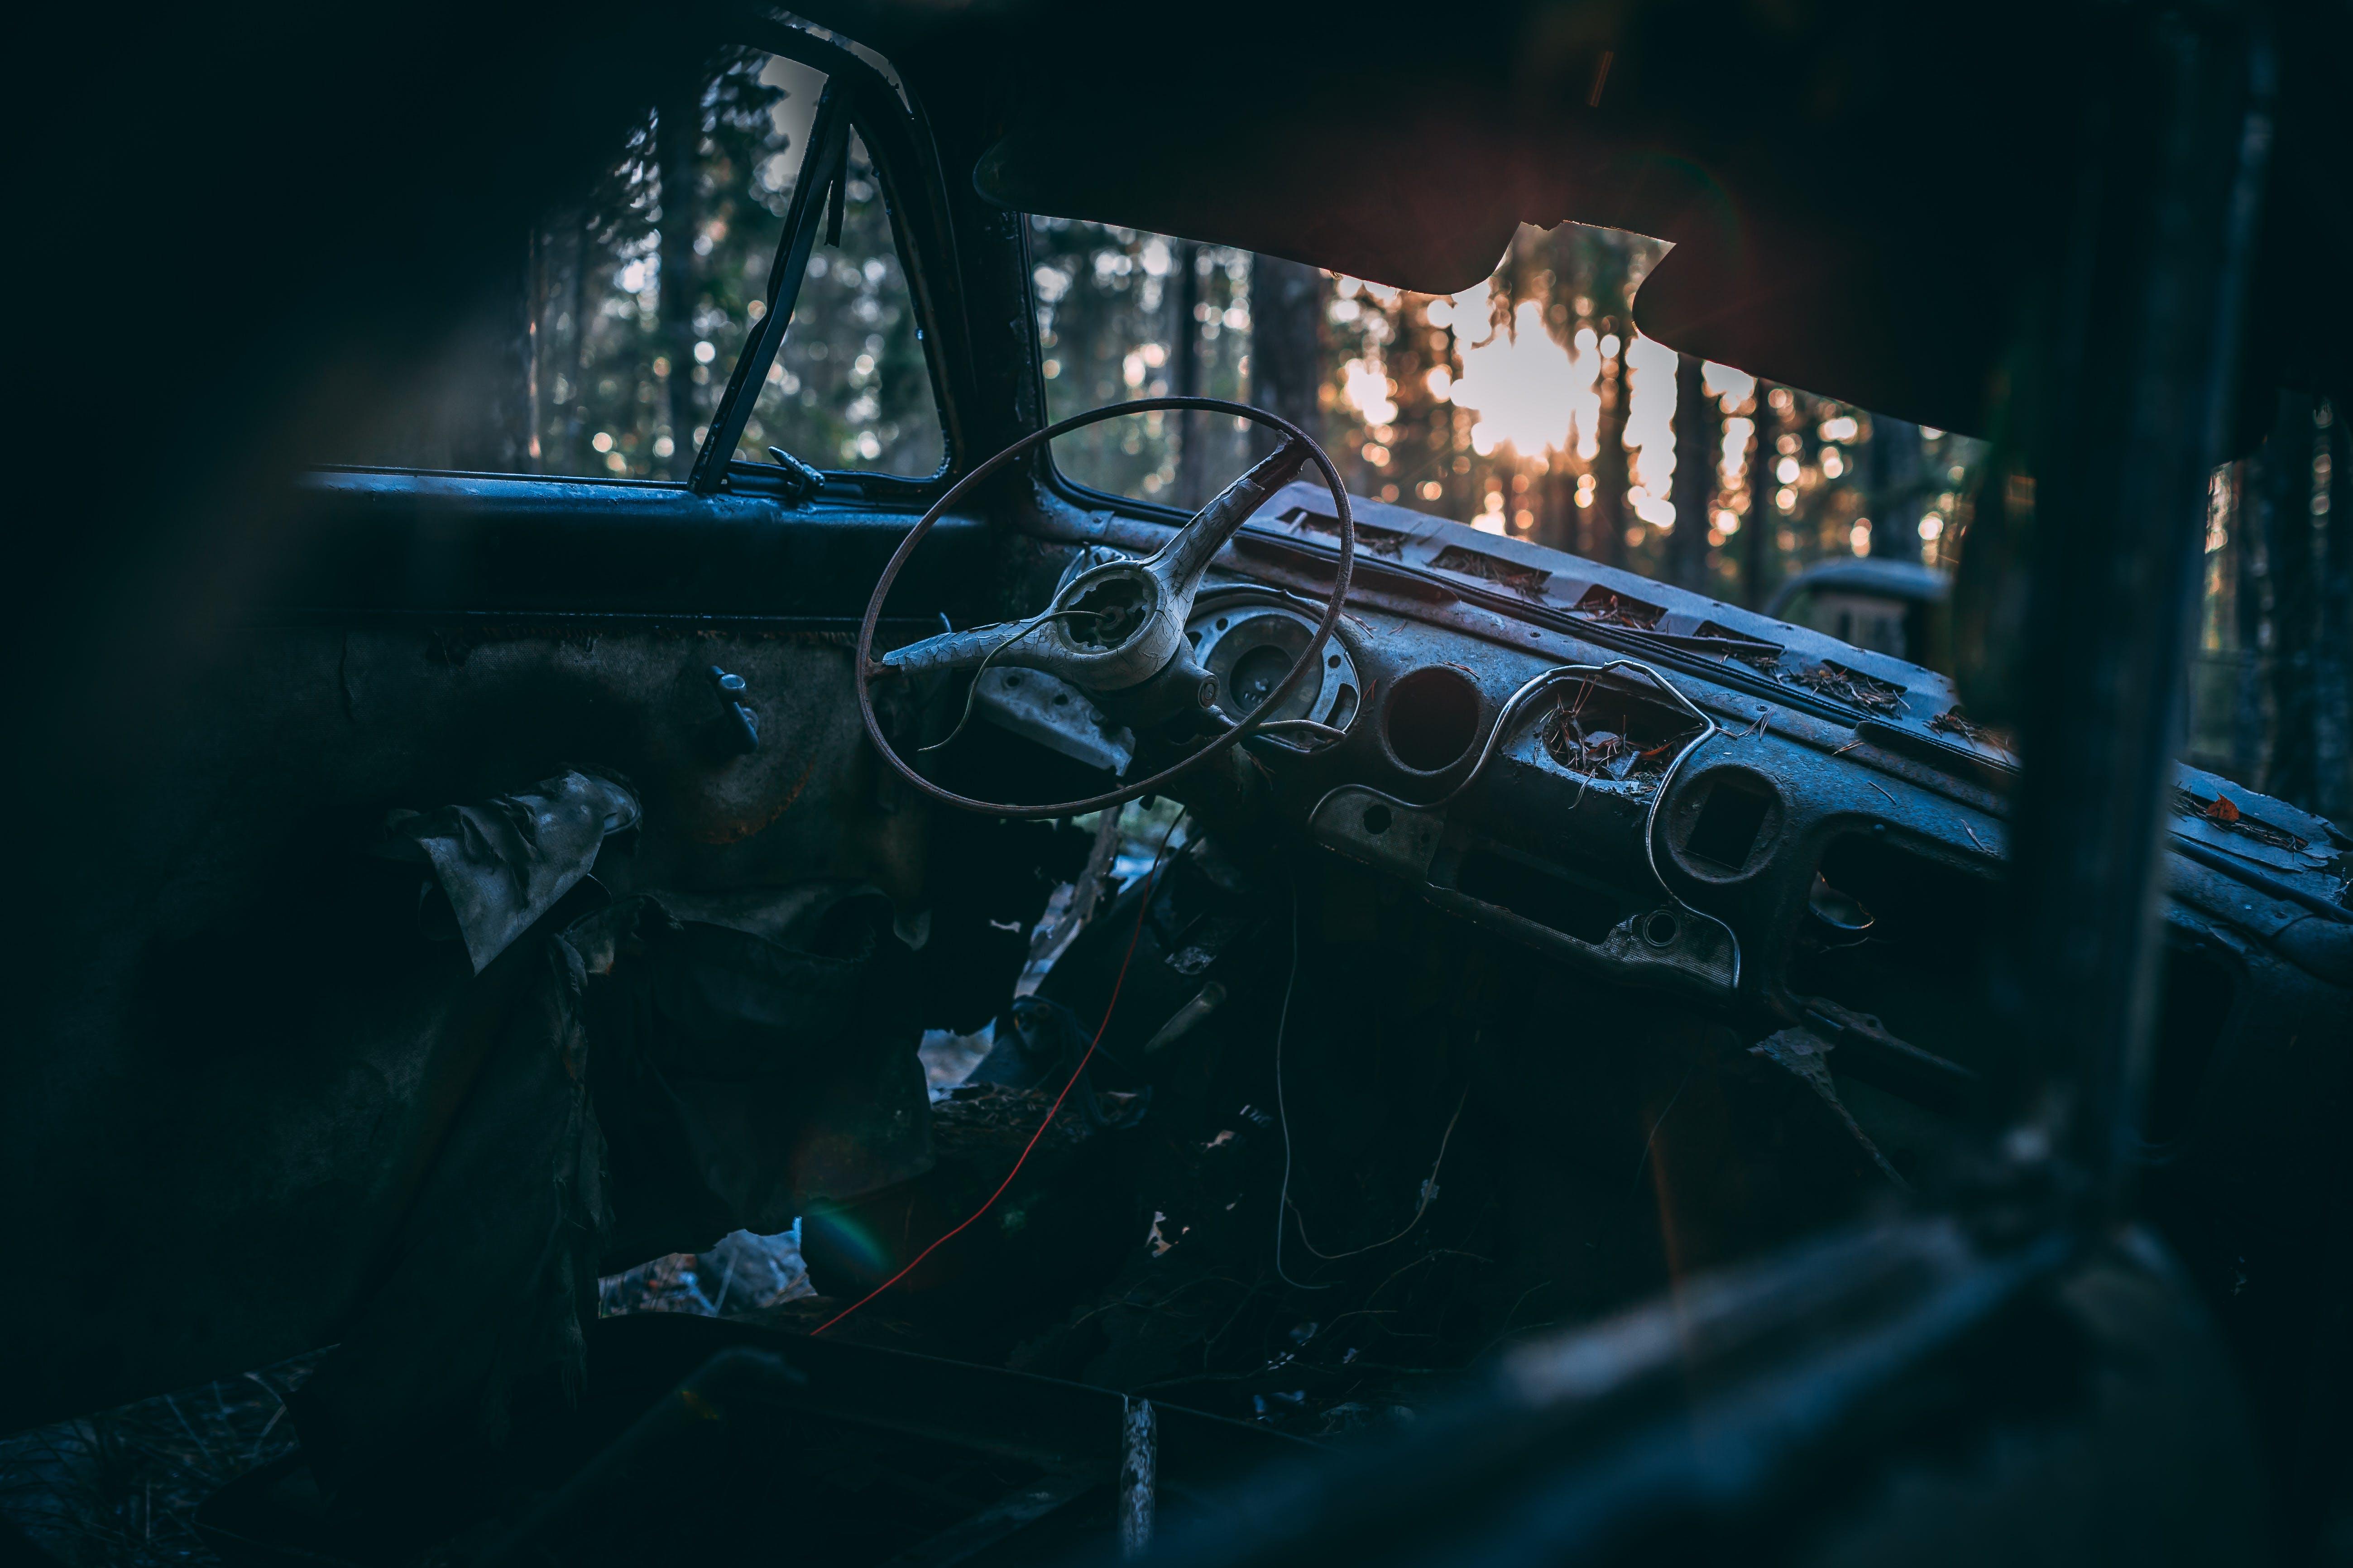 Kostenloses Stock Foto zu abendsonne, armaturenbrett, auto, autoinnenraum